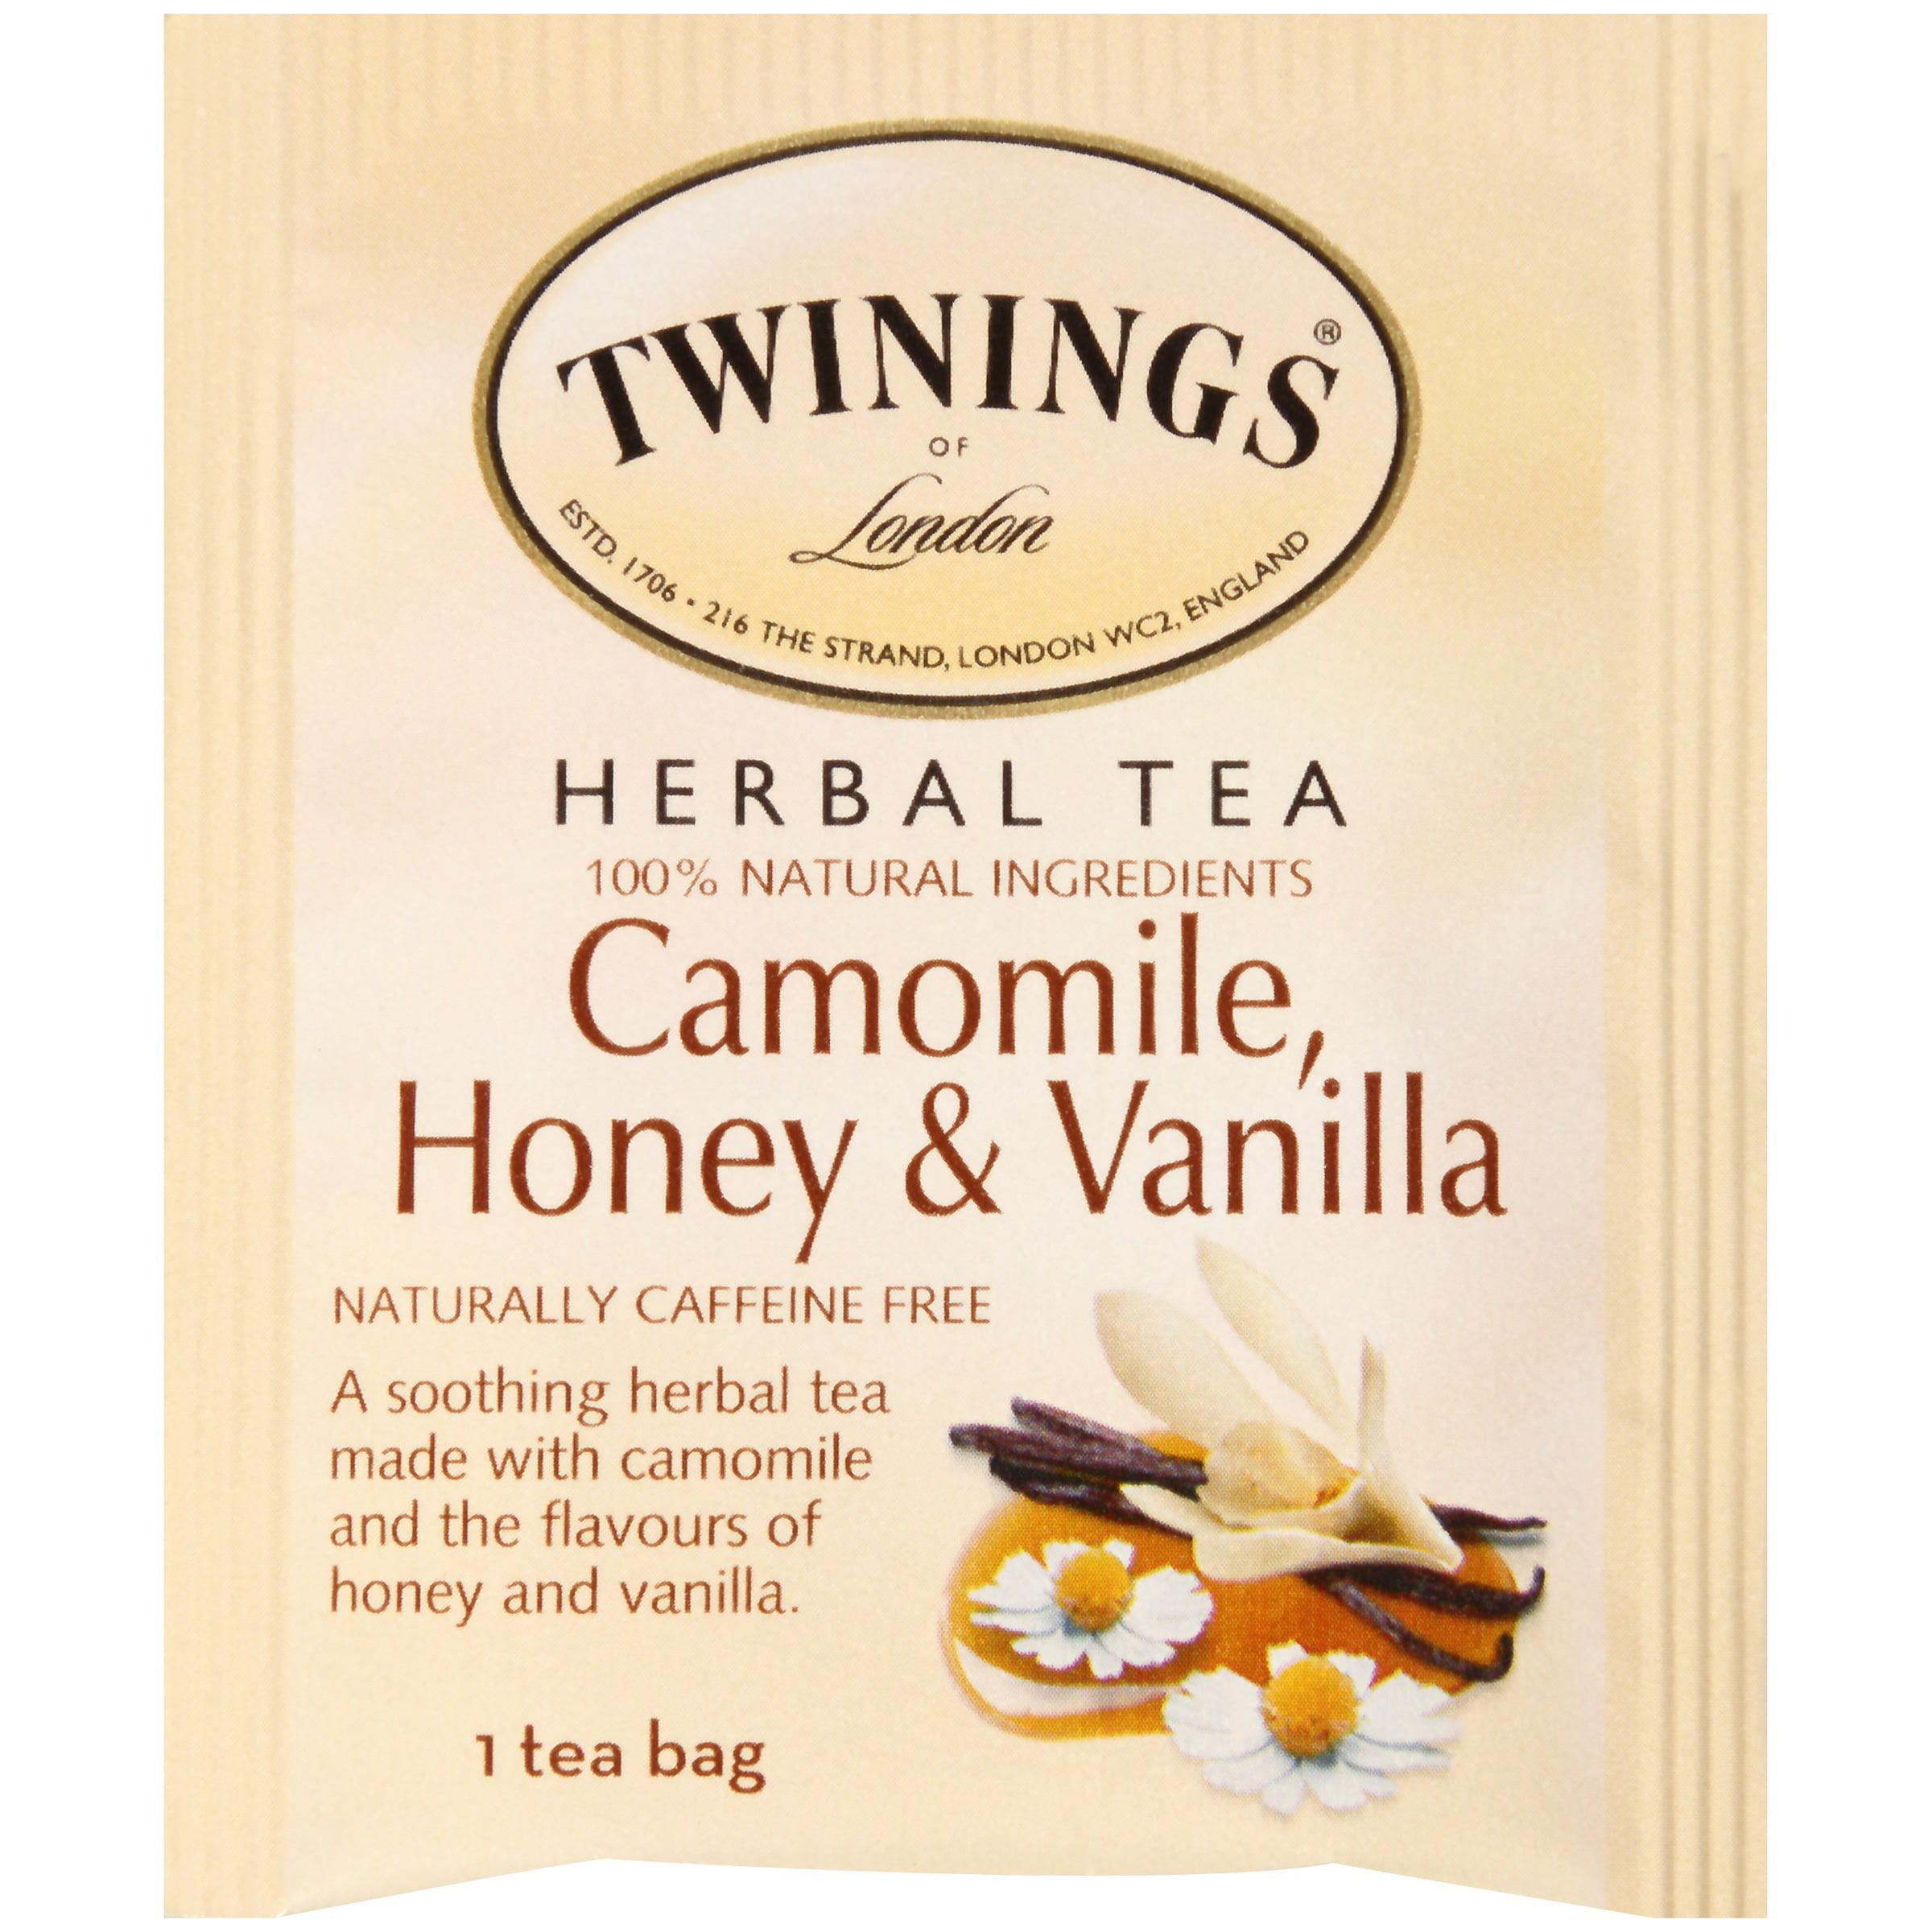 London Camomile, Honey & Vanilla